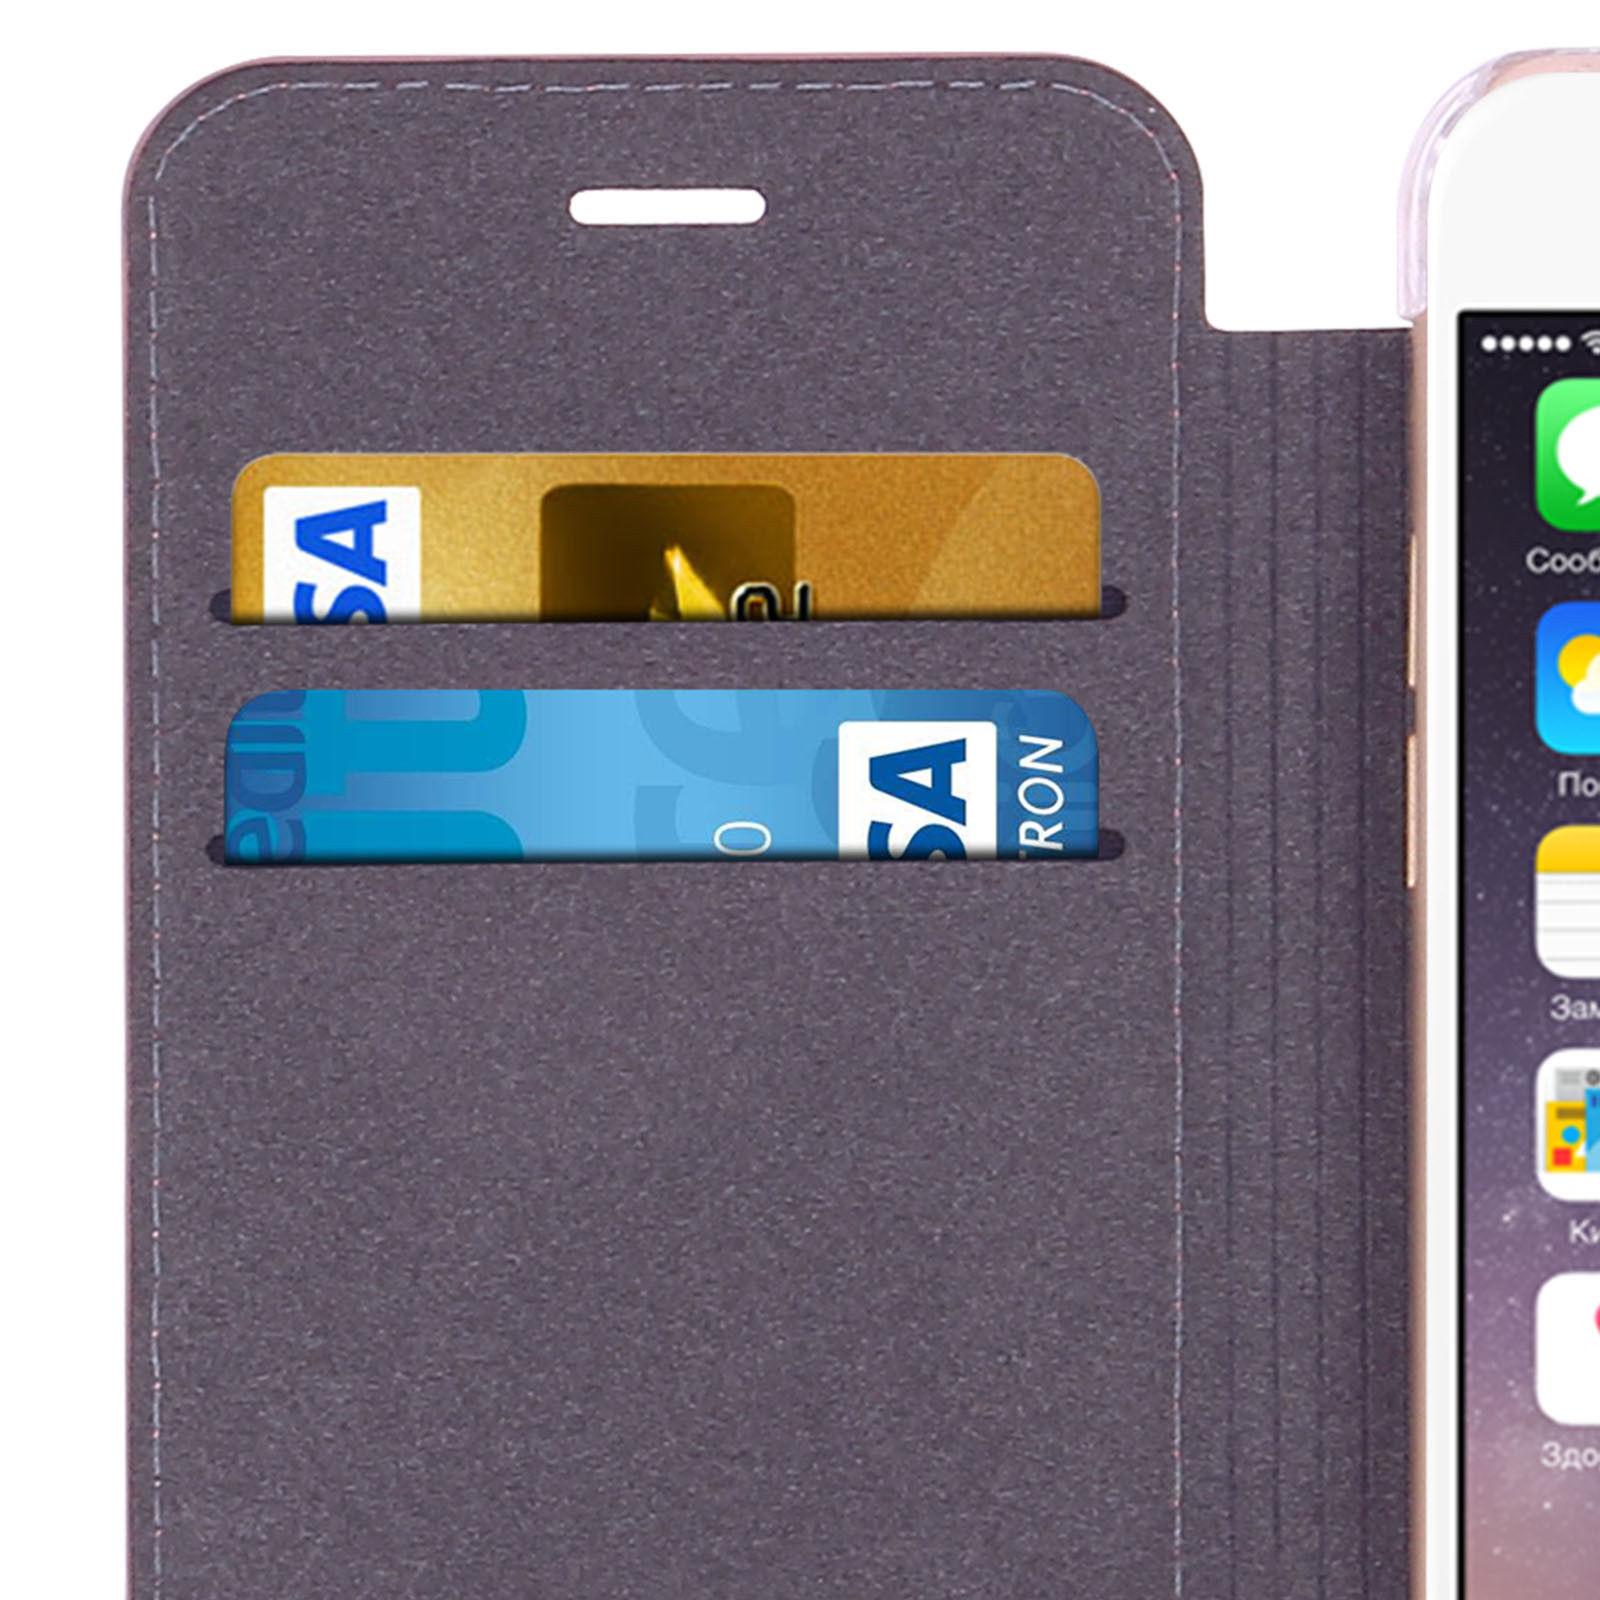 Ochranný kryt / pouzdro pro iPhone 7 / 8 - Guess, Kaia Book RoseGold